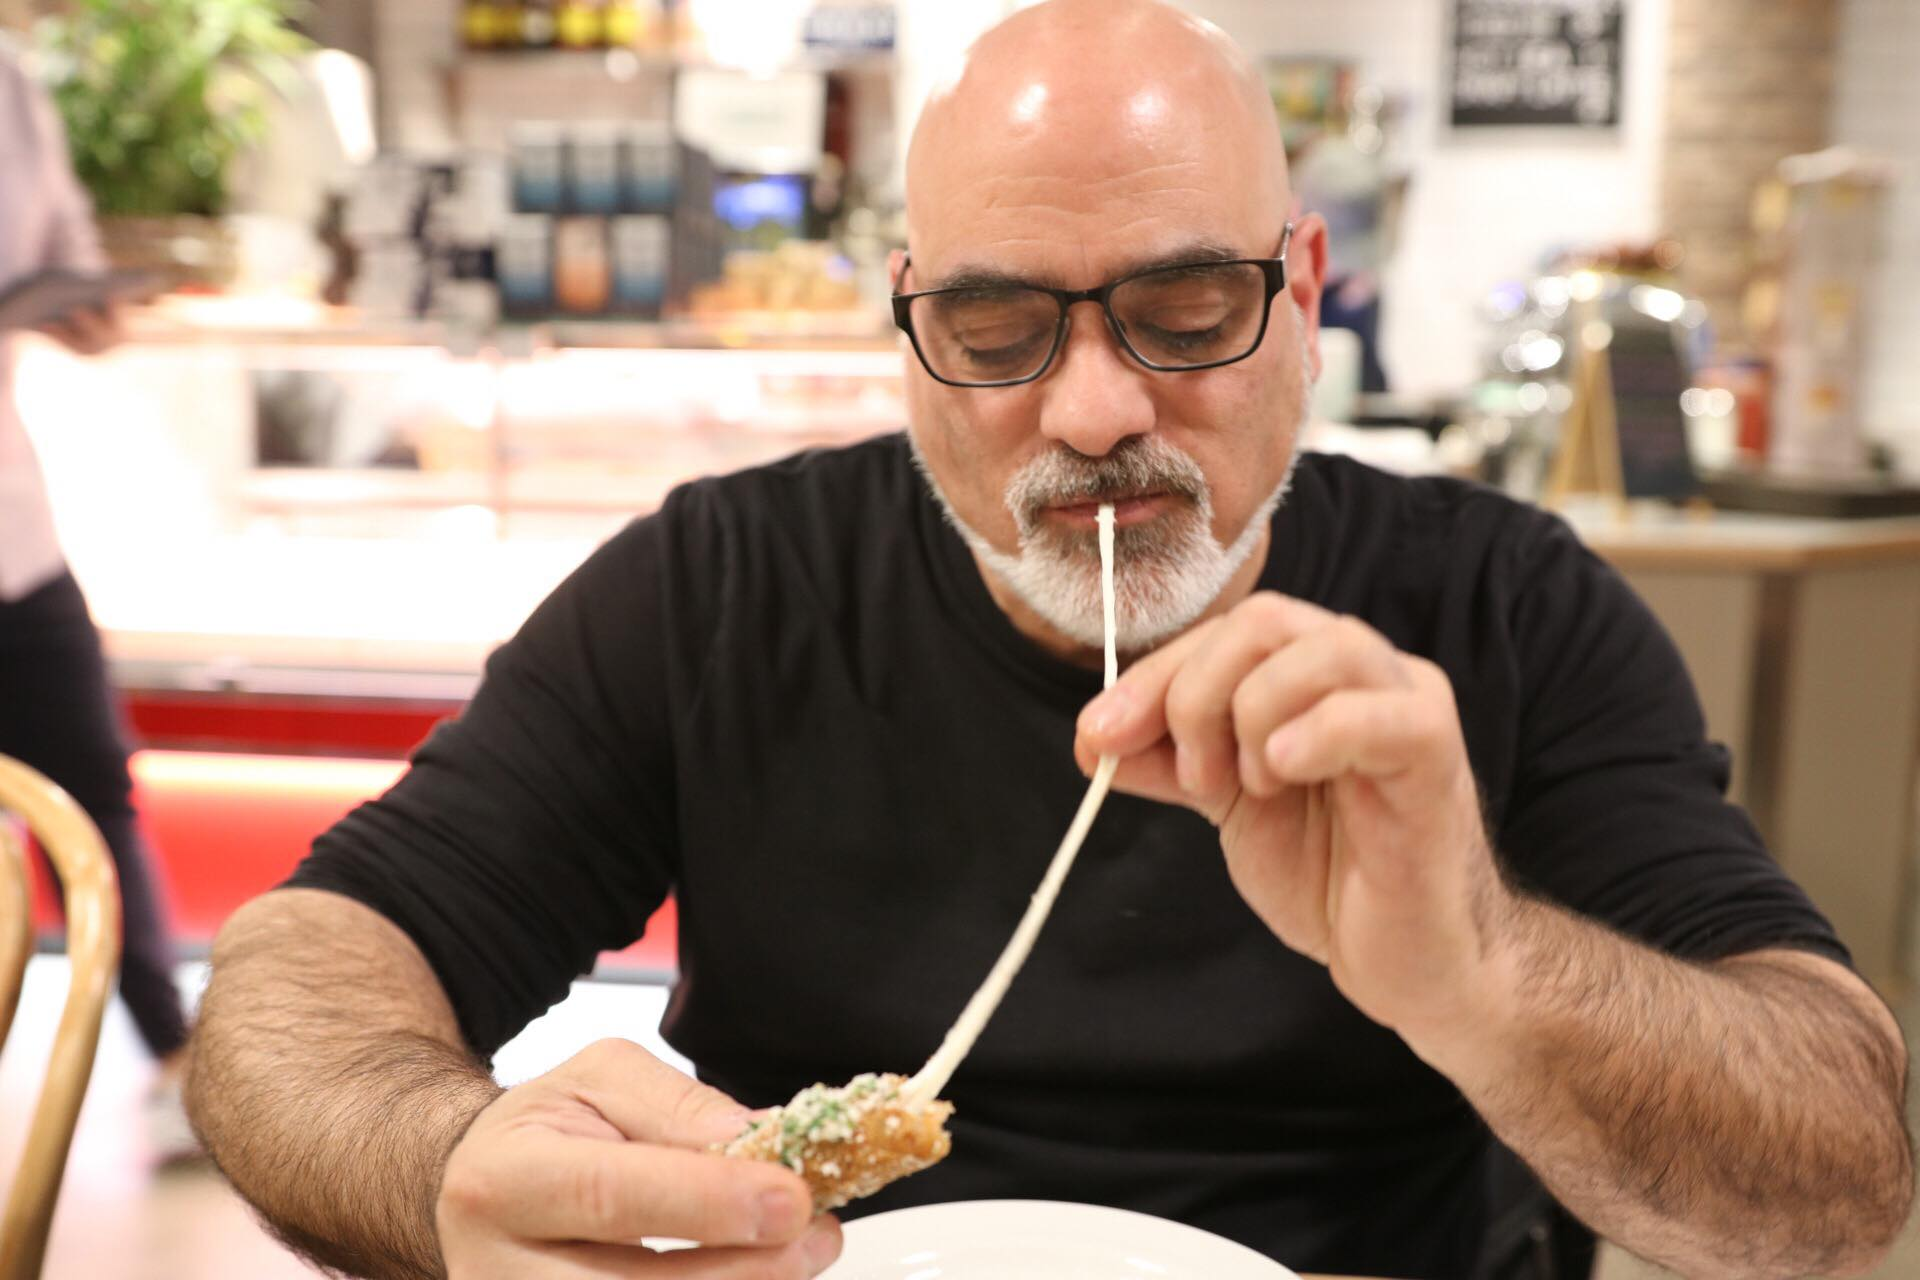 pasta shop fresh stretchy mozz eric two.jpg